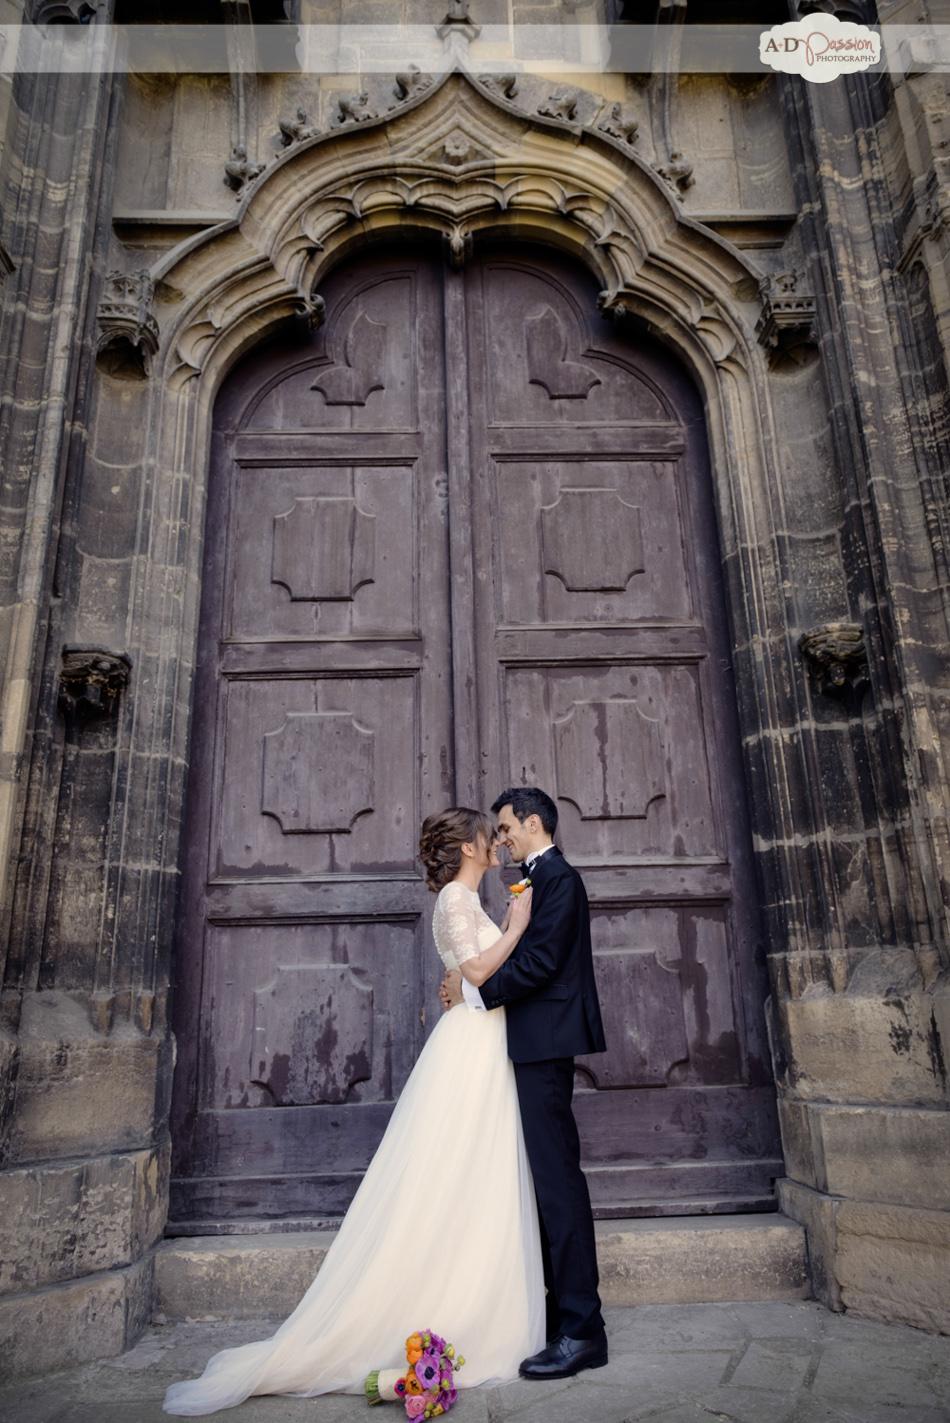 AD Passion Photography | 20130529_fotograf-nunta_elisa_si_marius_0061 | Adelin, Dida, fotograf profesionist, fotograf de nunta, fotografie de nunta, fotograf Timisoara, fotograf Craiova, fotograf Bucuresti, fotograf Arad, nunta Timisoara, nunta Arad, nunta Bucuresti, nunta Craiova